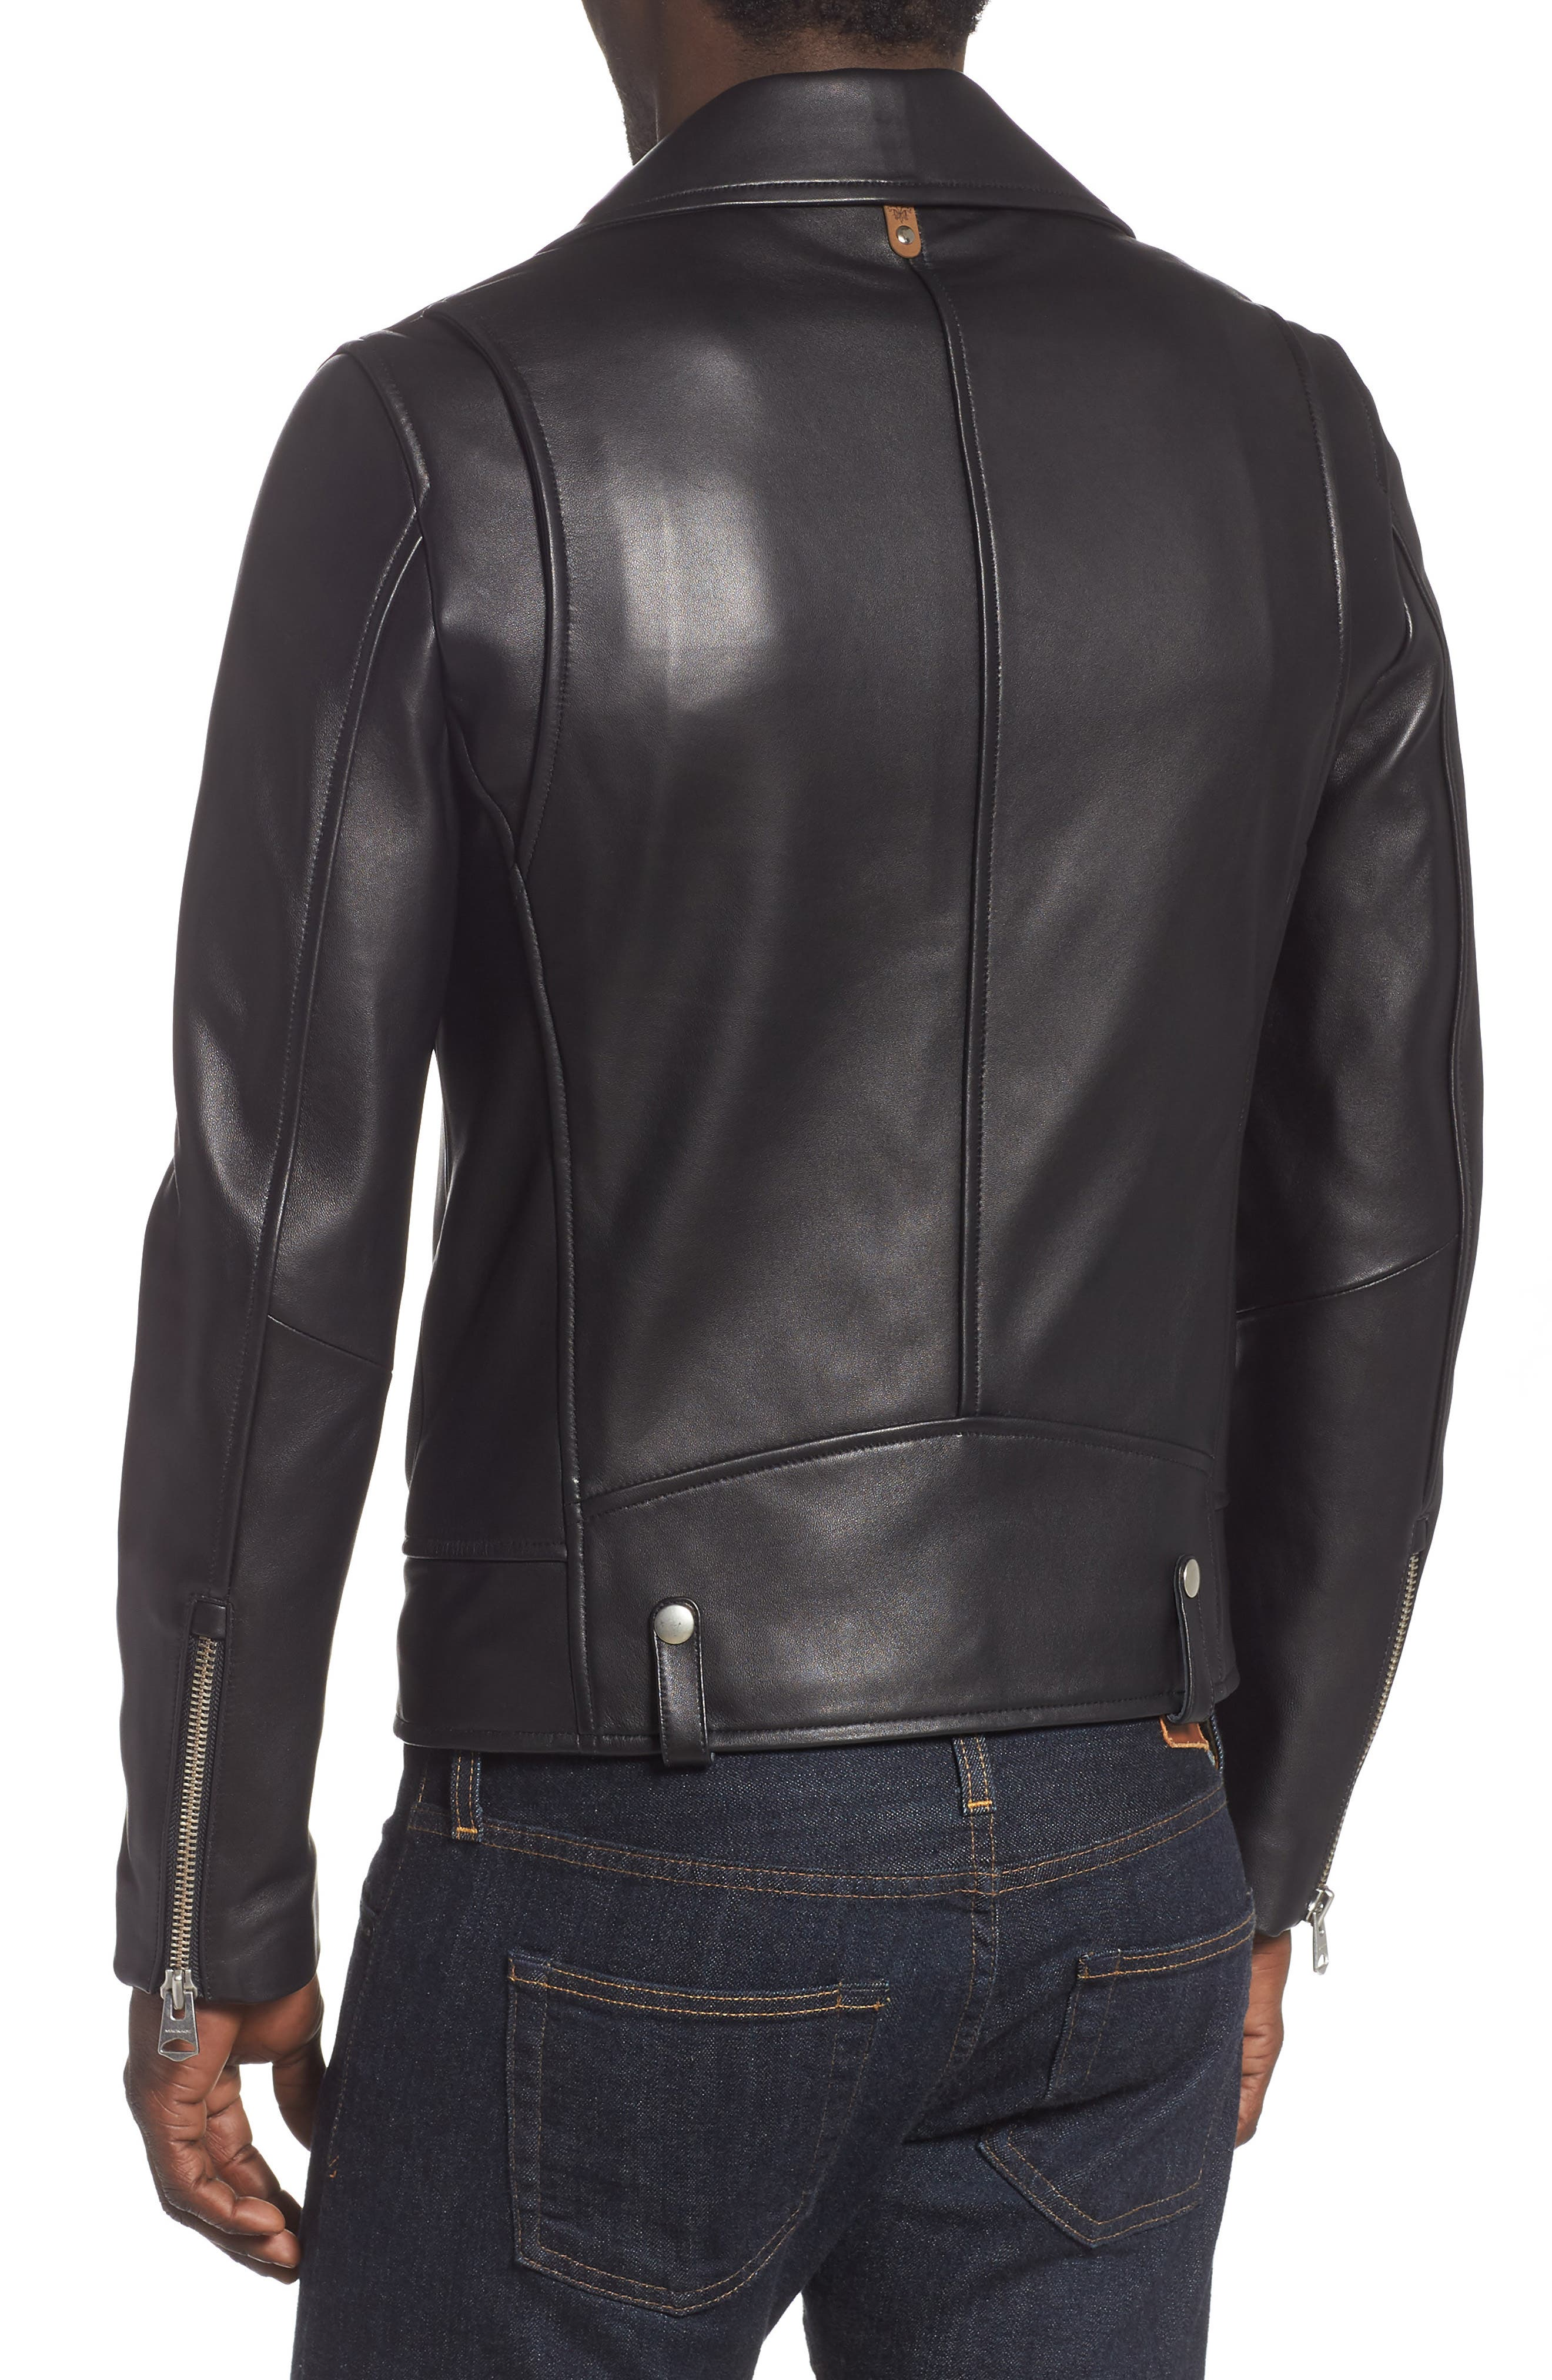 MACKAGE, Fenton Leather Moto Jacket, Alternate thumbnail 2, color, BLACK